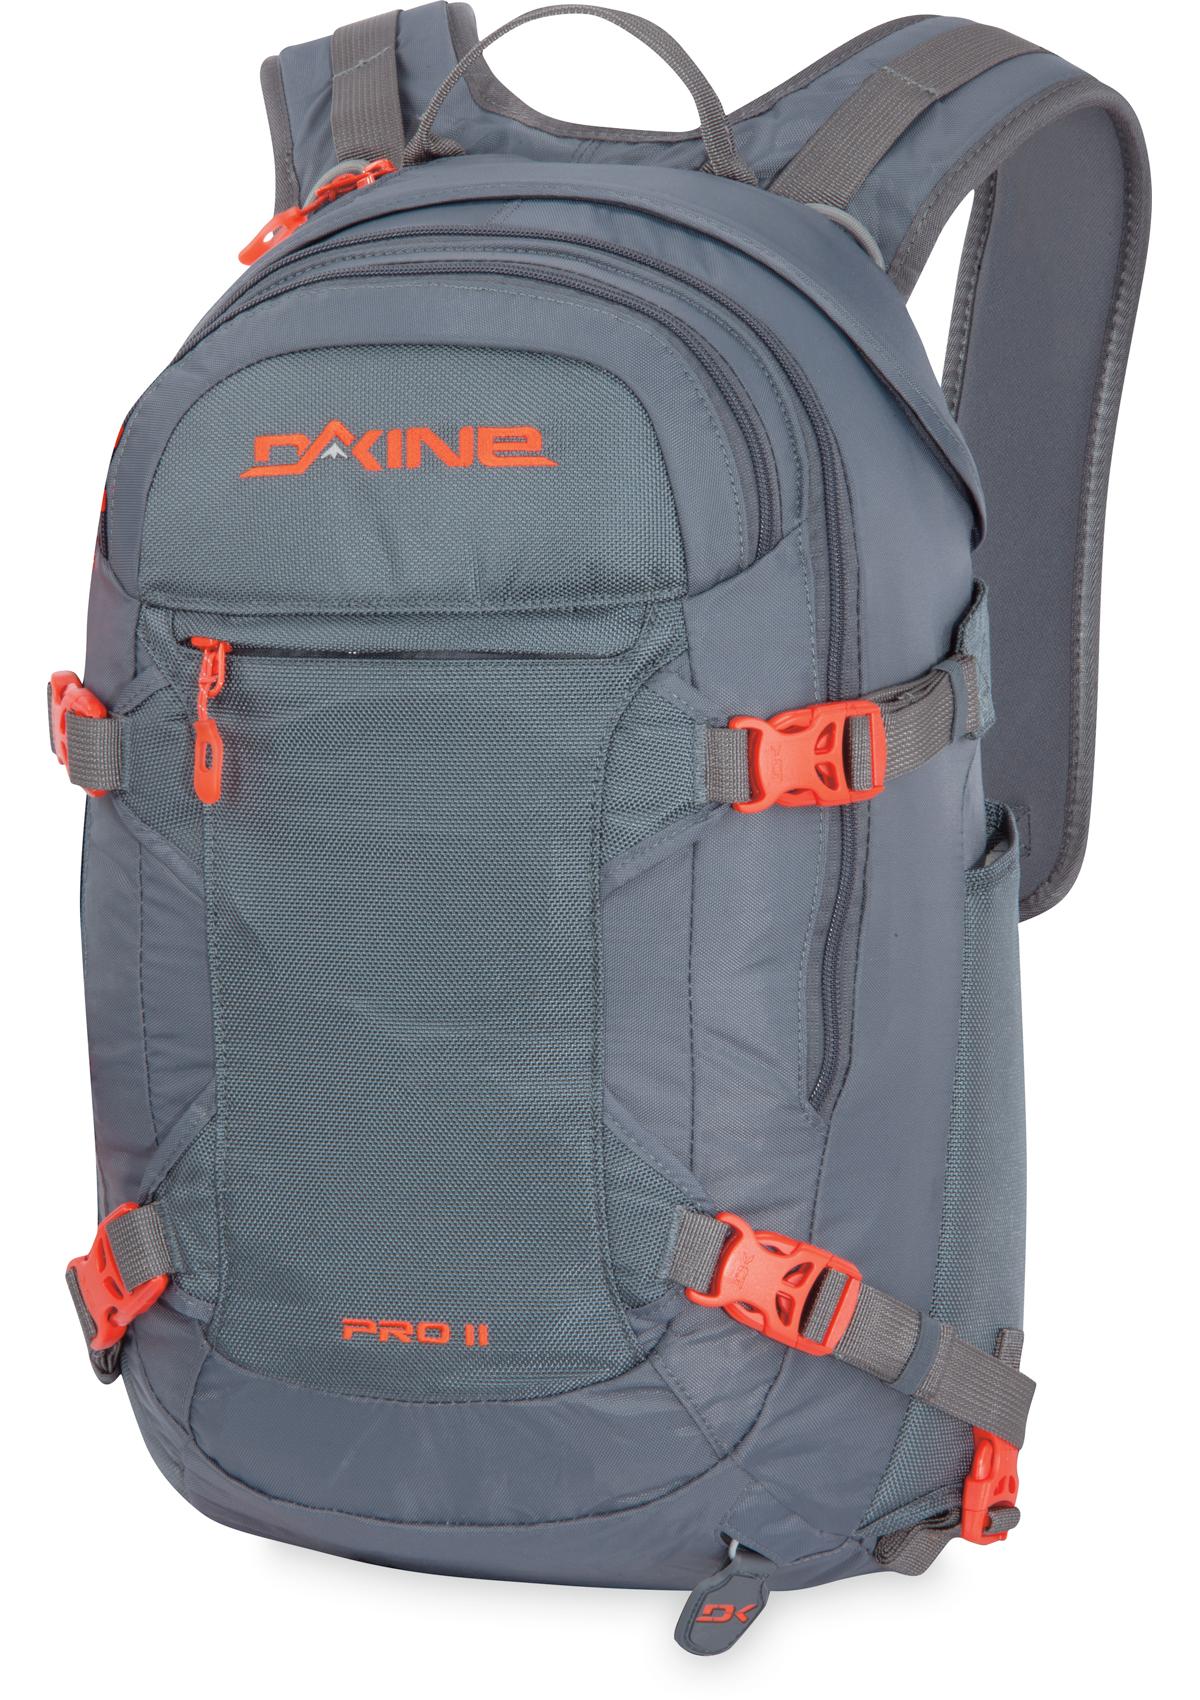 Dakine Pro 2 Backpack – TrendBackpack